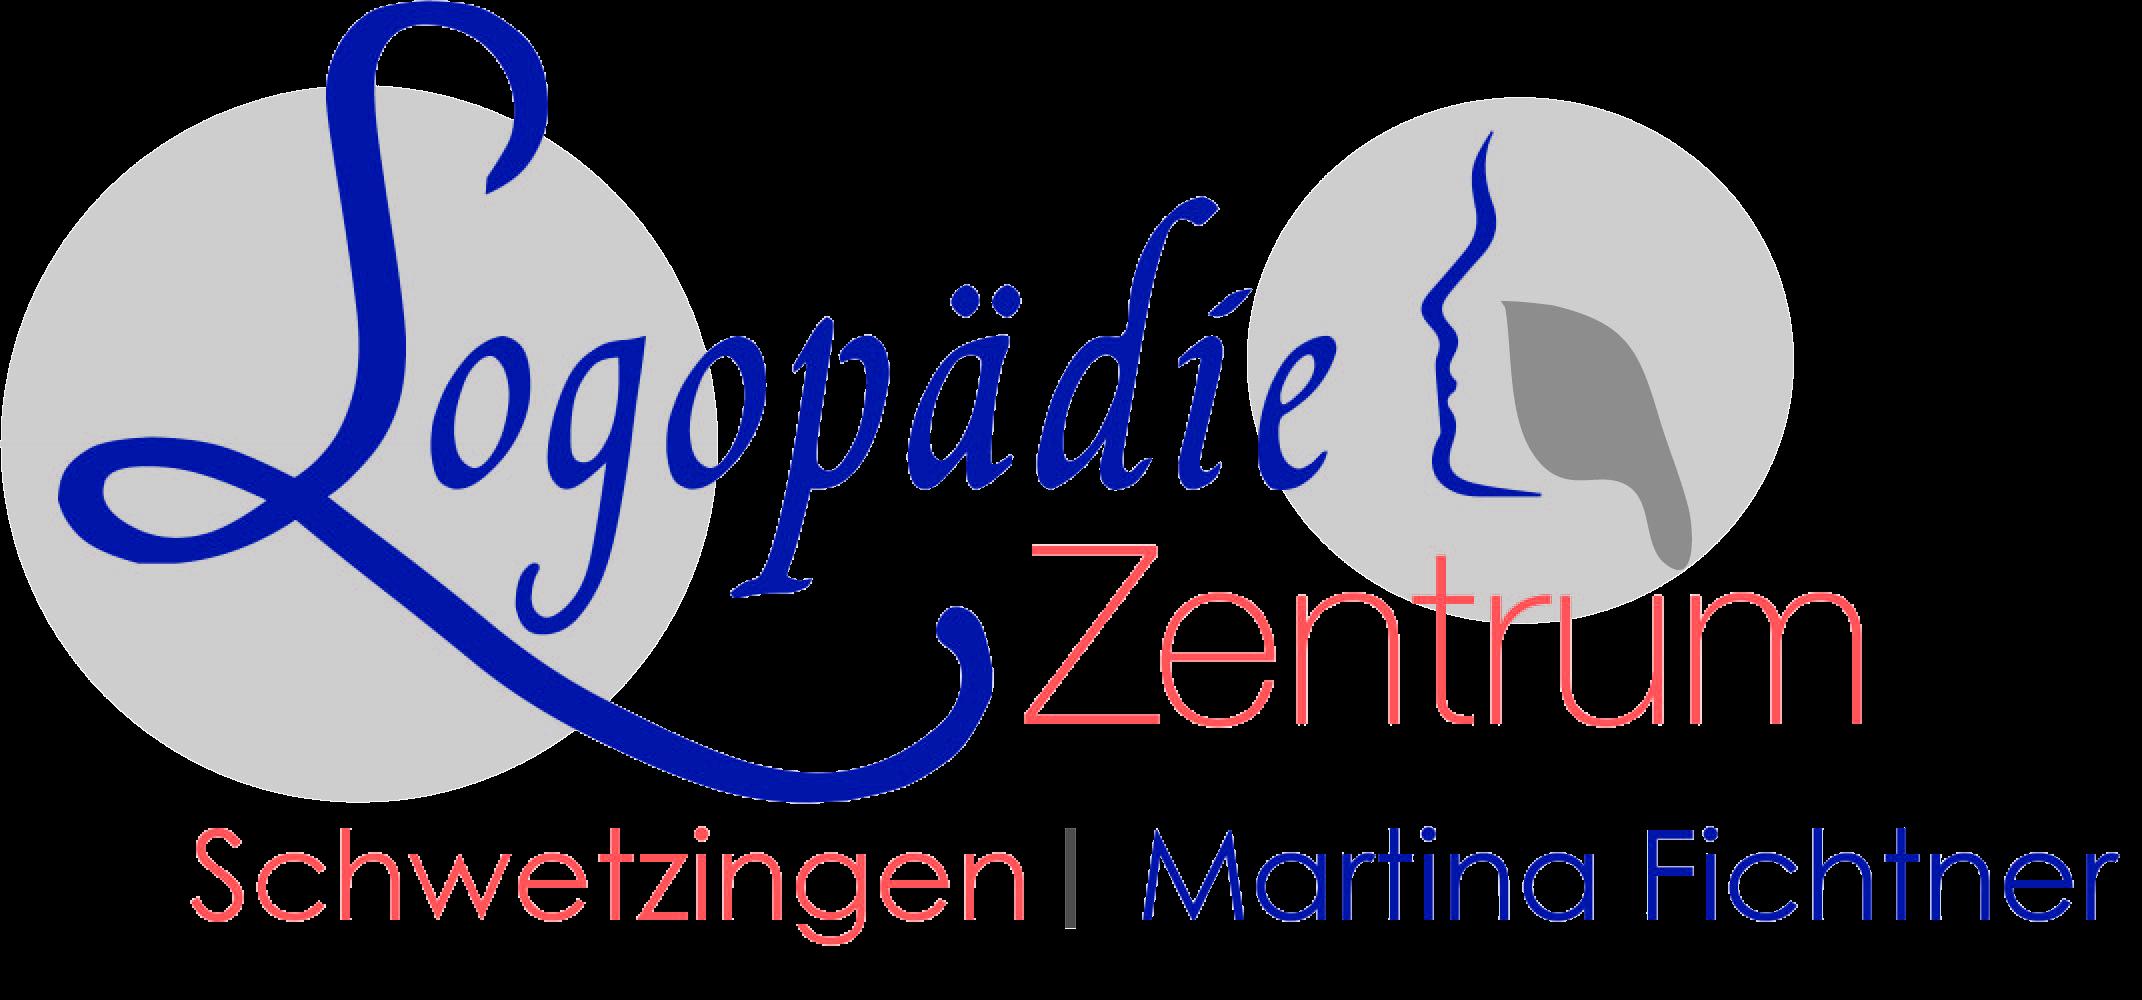 Logopädie Zentrum Schwetzingen